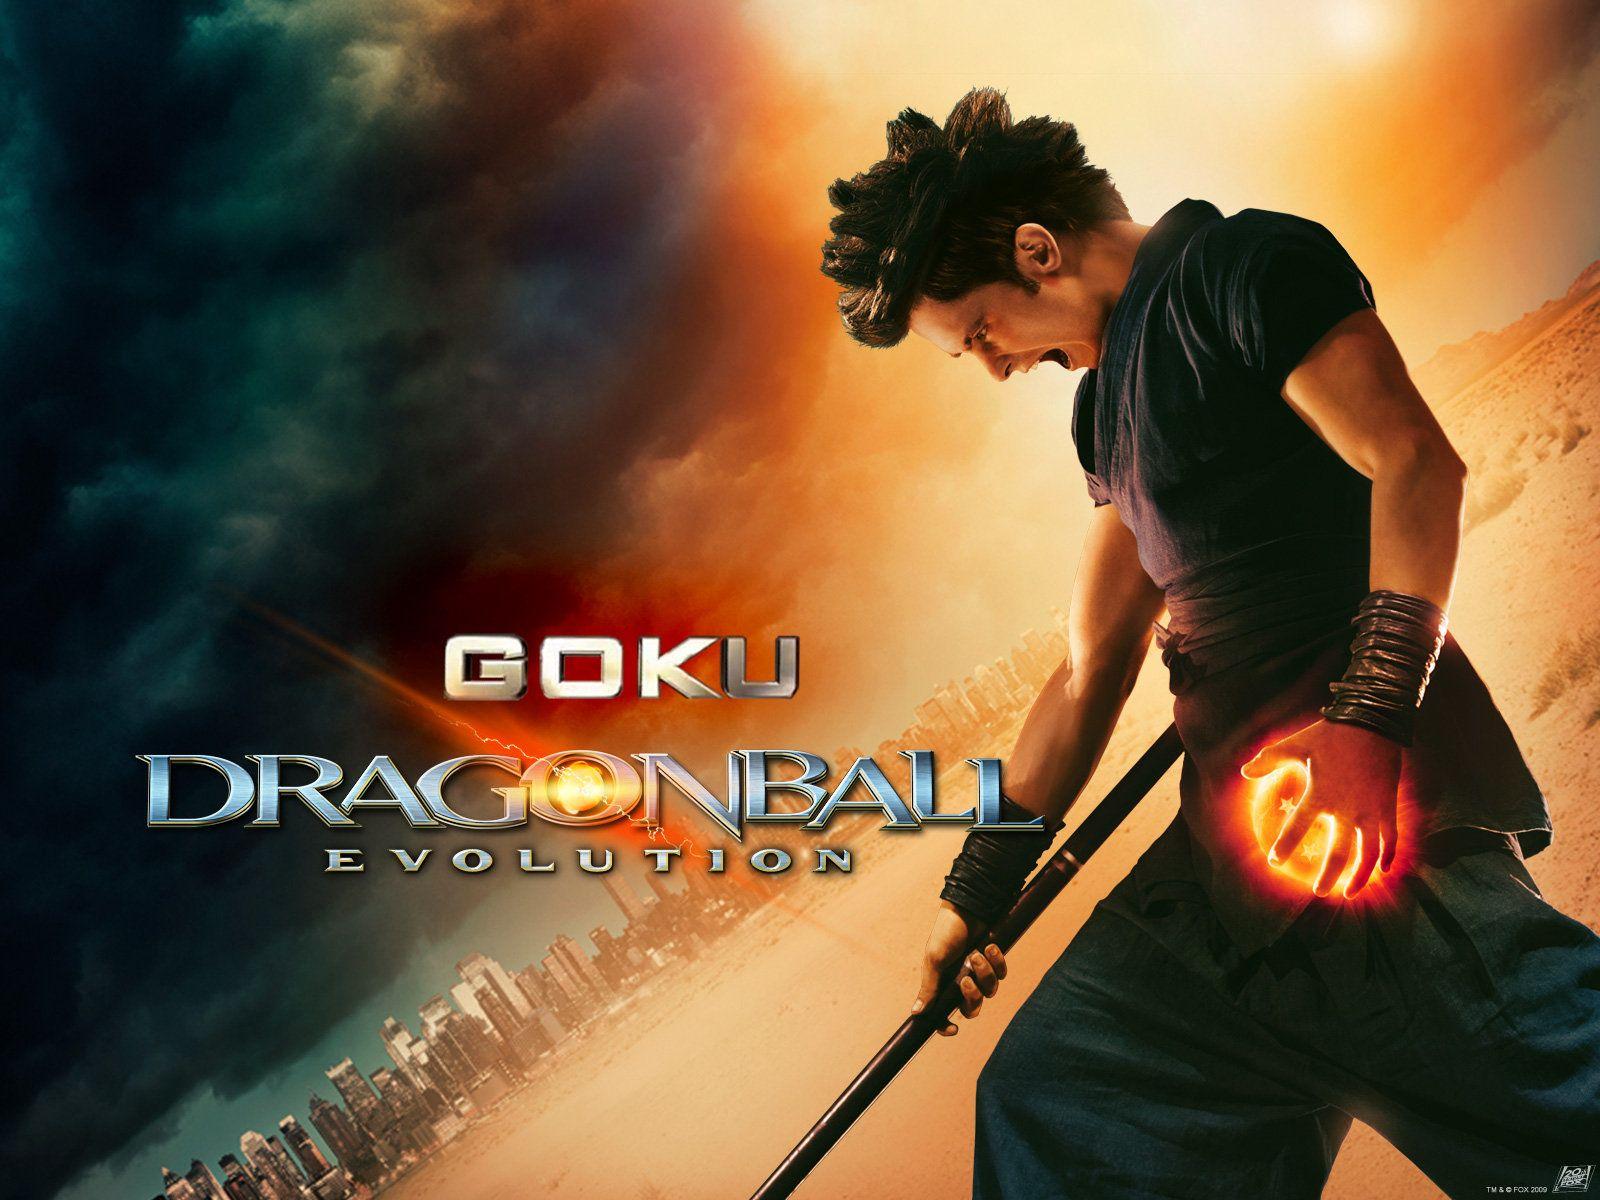 Live Wallpaper Dragon Ball Iphone X Papel De Parede Dragonball Evolution 9 Wallpaper Para